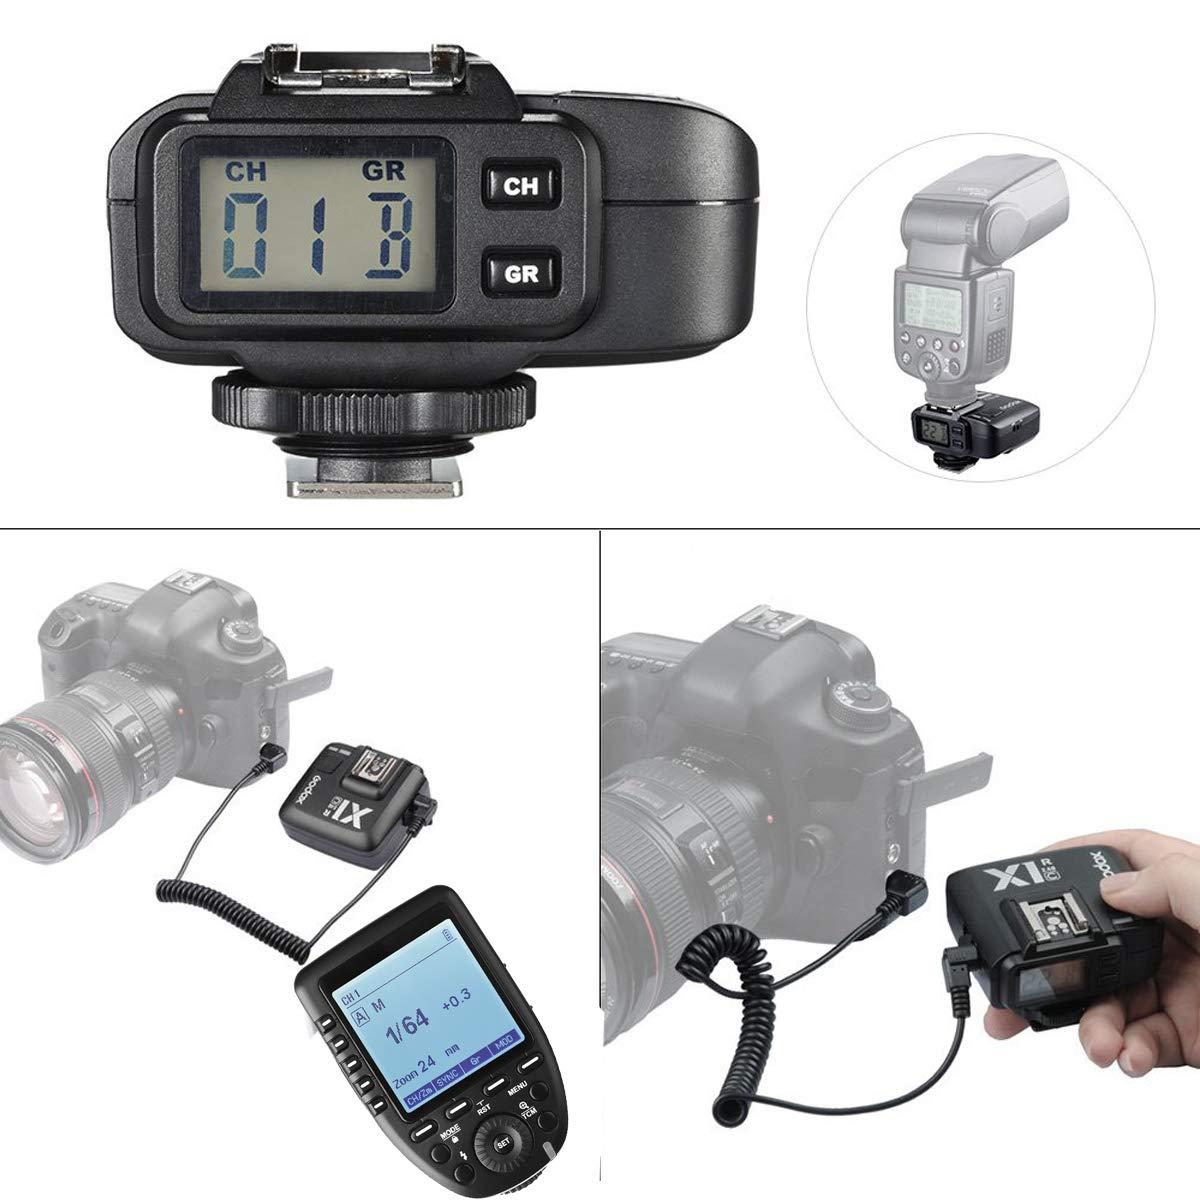 Electronics Remote Triggers ghdonat.com Godox Xpro-C 2.4G X System ...